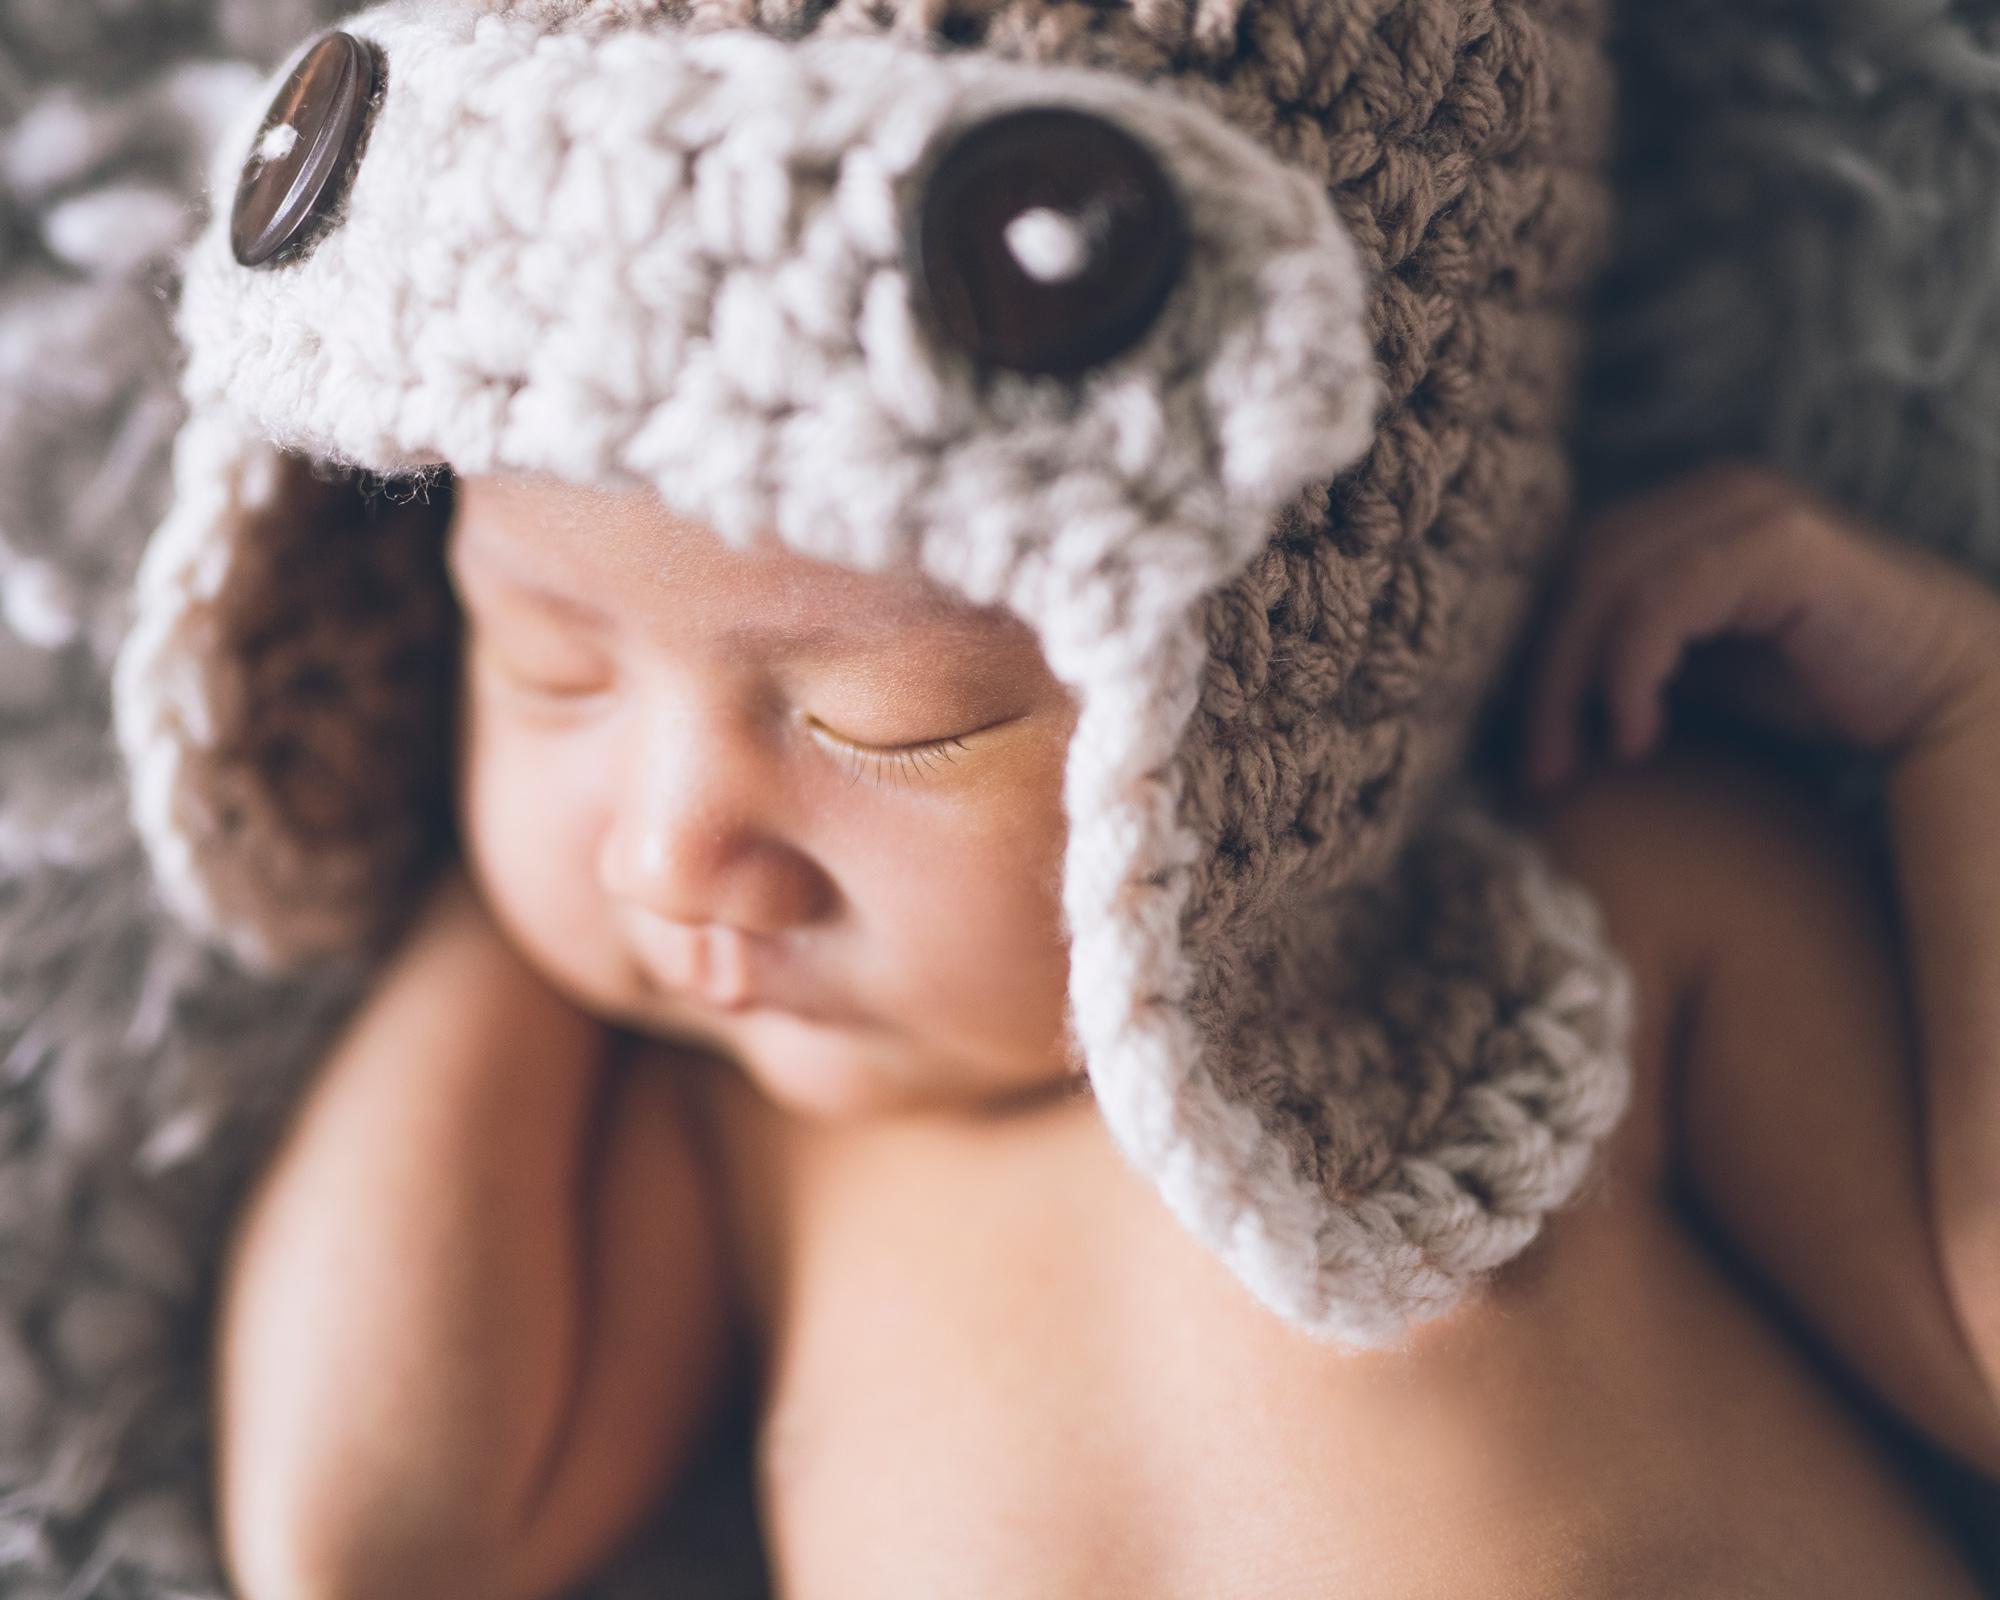 san-francisco-newborn-baby-photographer-8.jpg